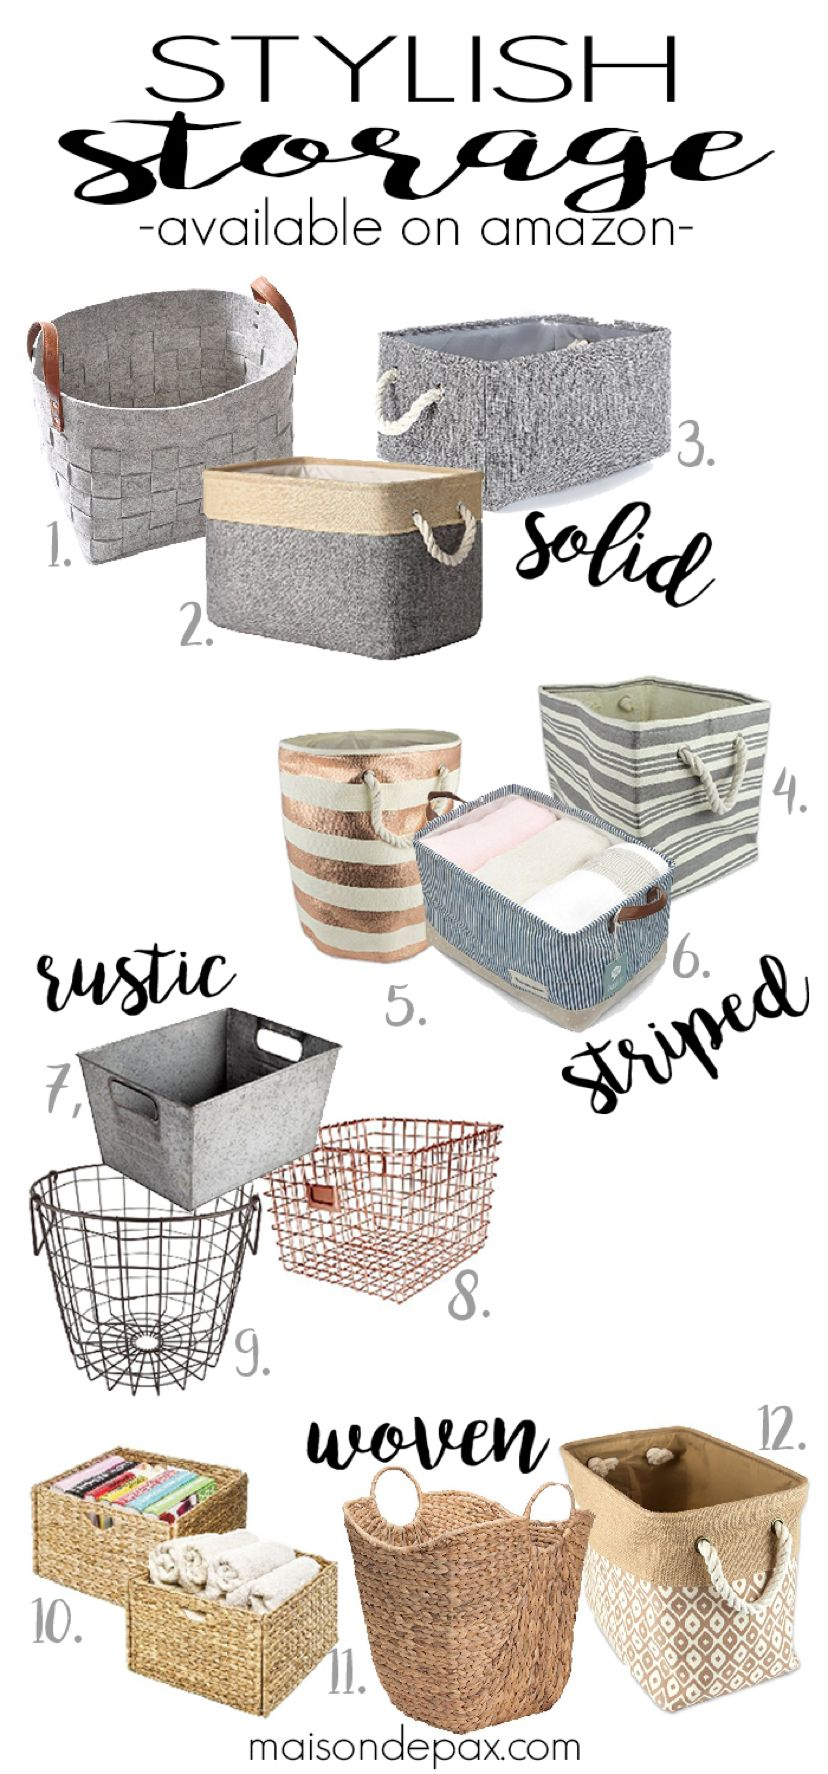 Stylish Storage Baskets and Bins (Amazon Finds) | Apartment ...